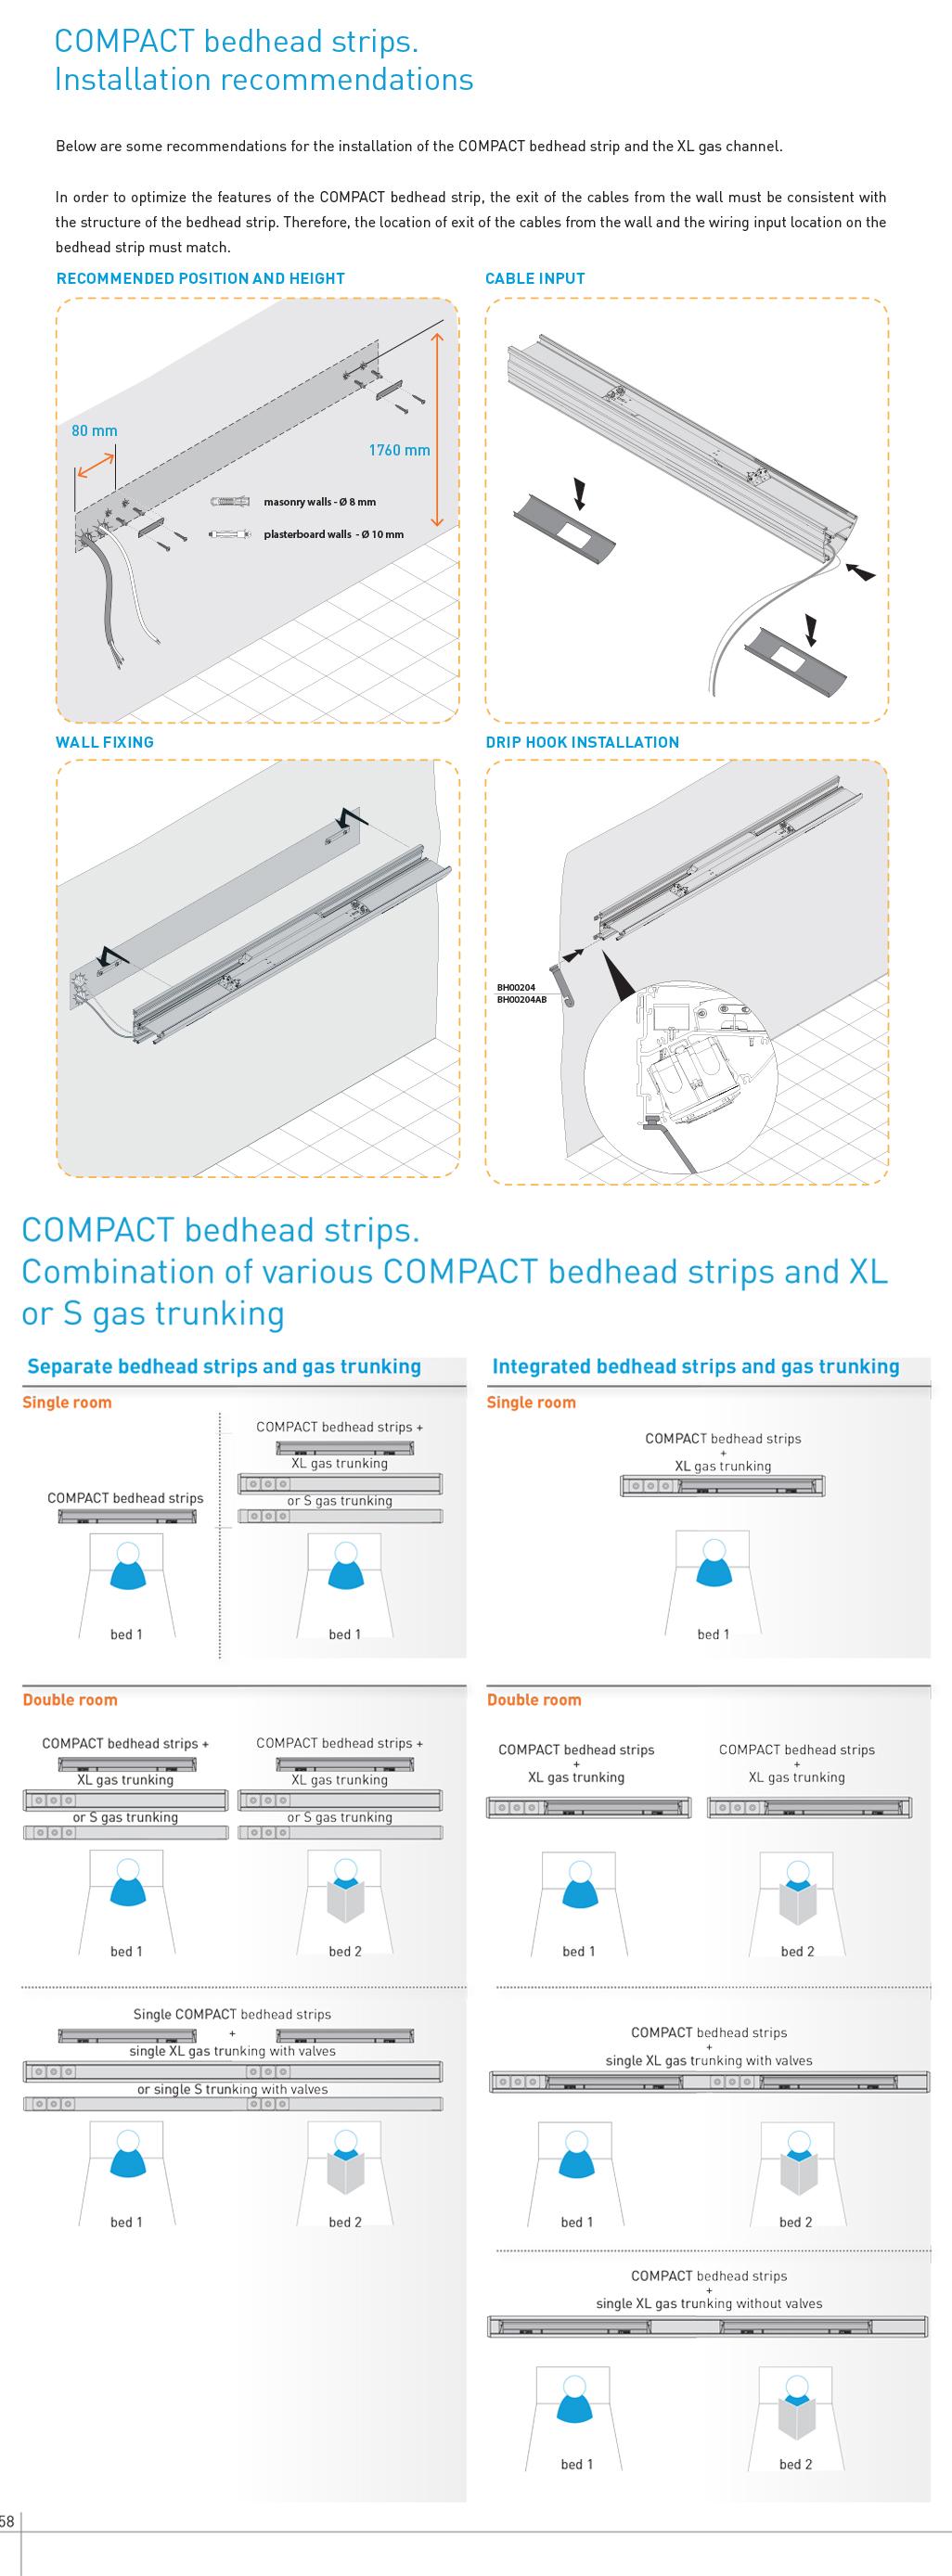 Compact-bedhead-strips